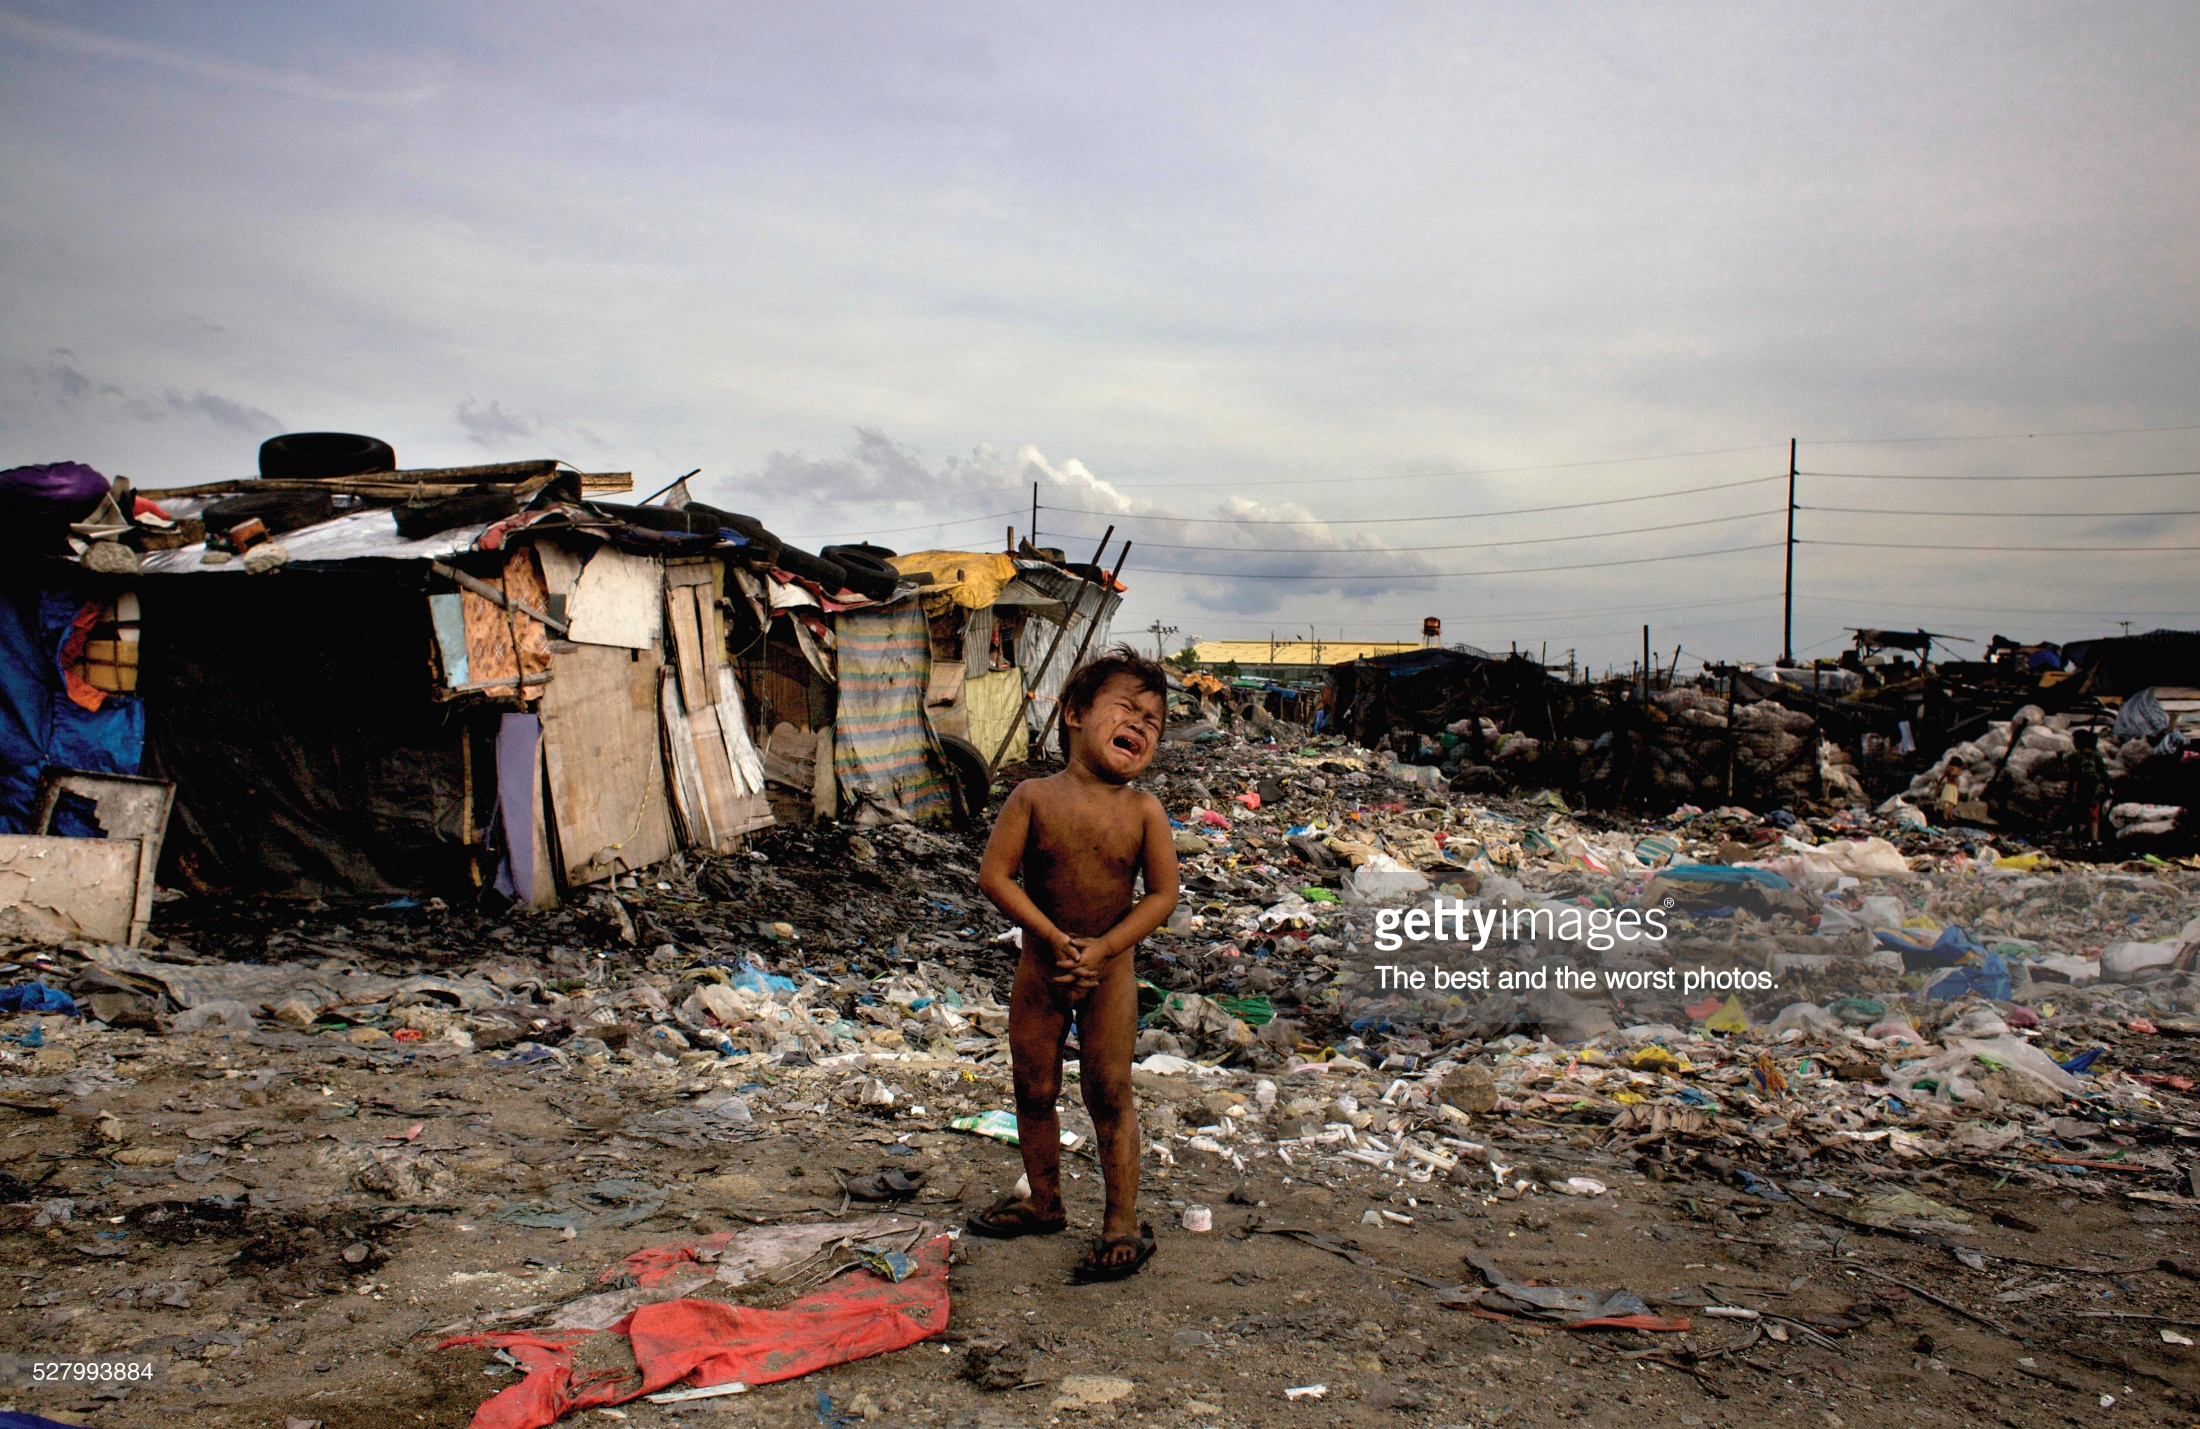 Thumbnail for Poverty